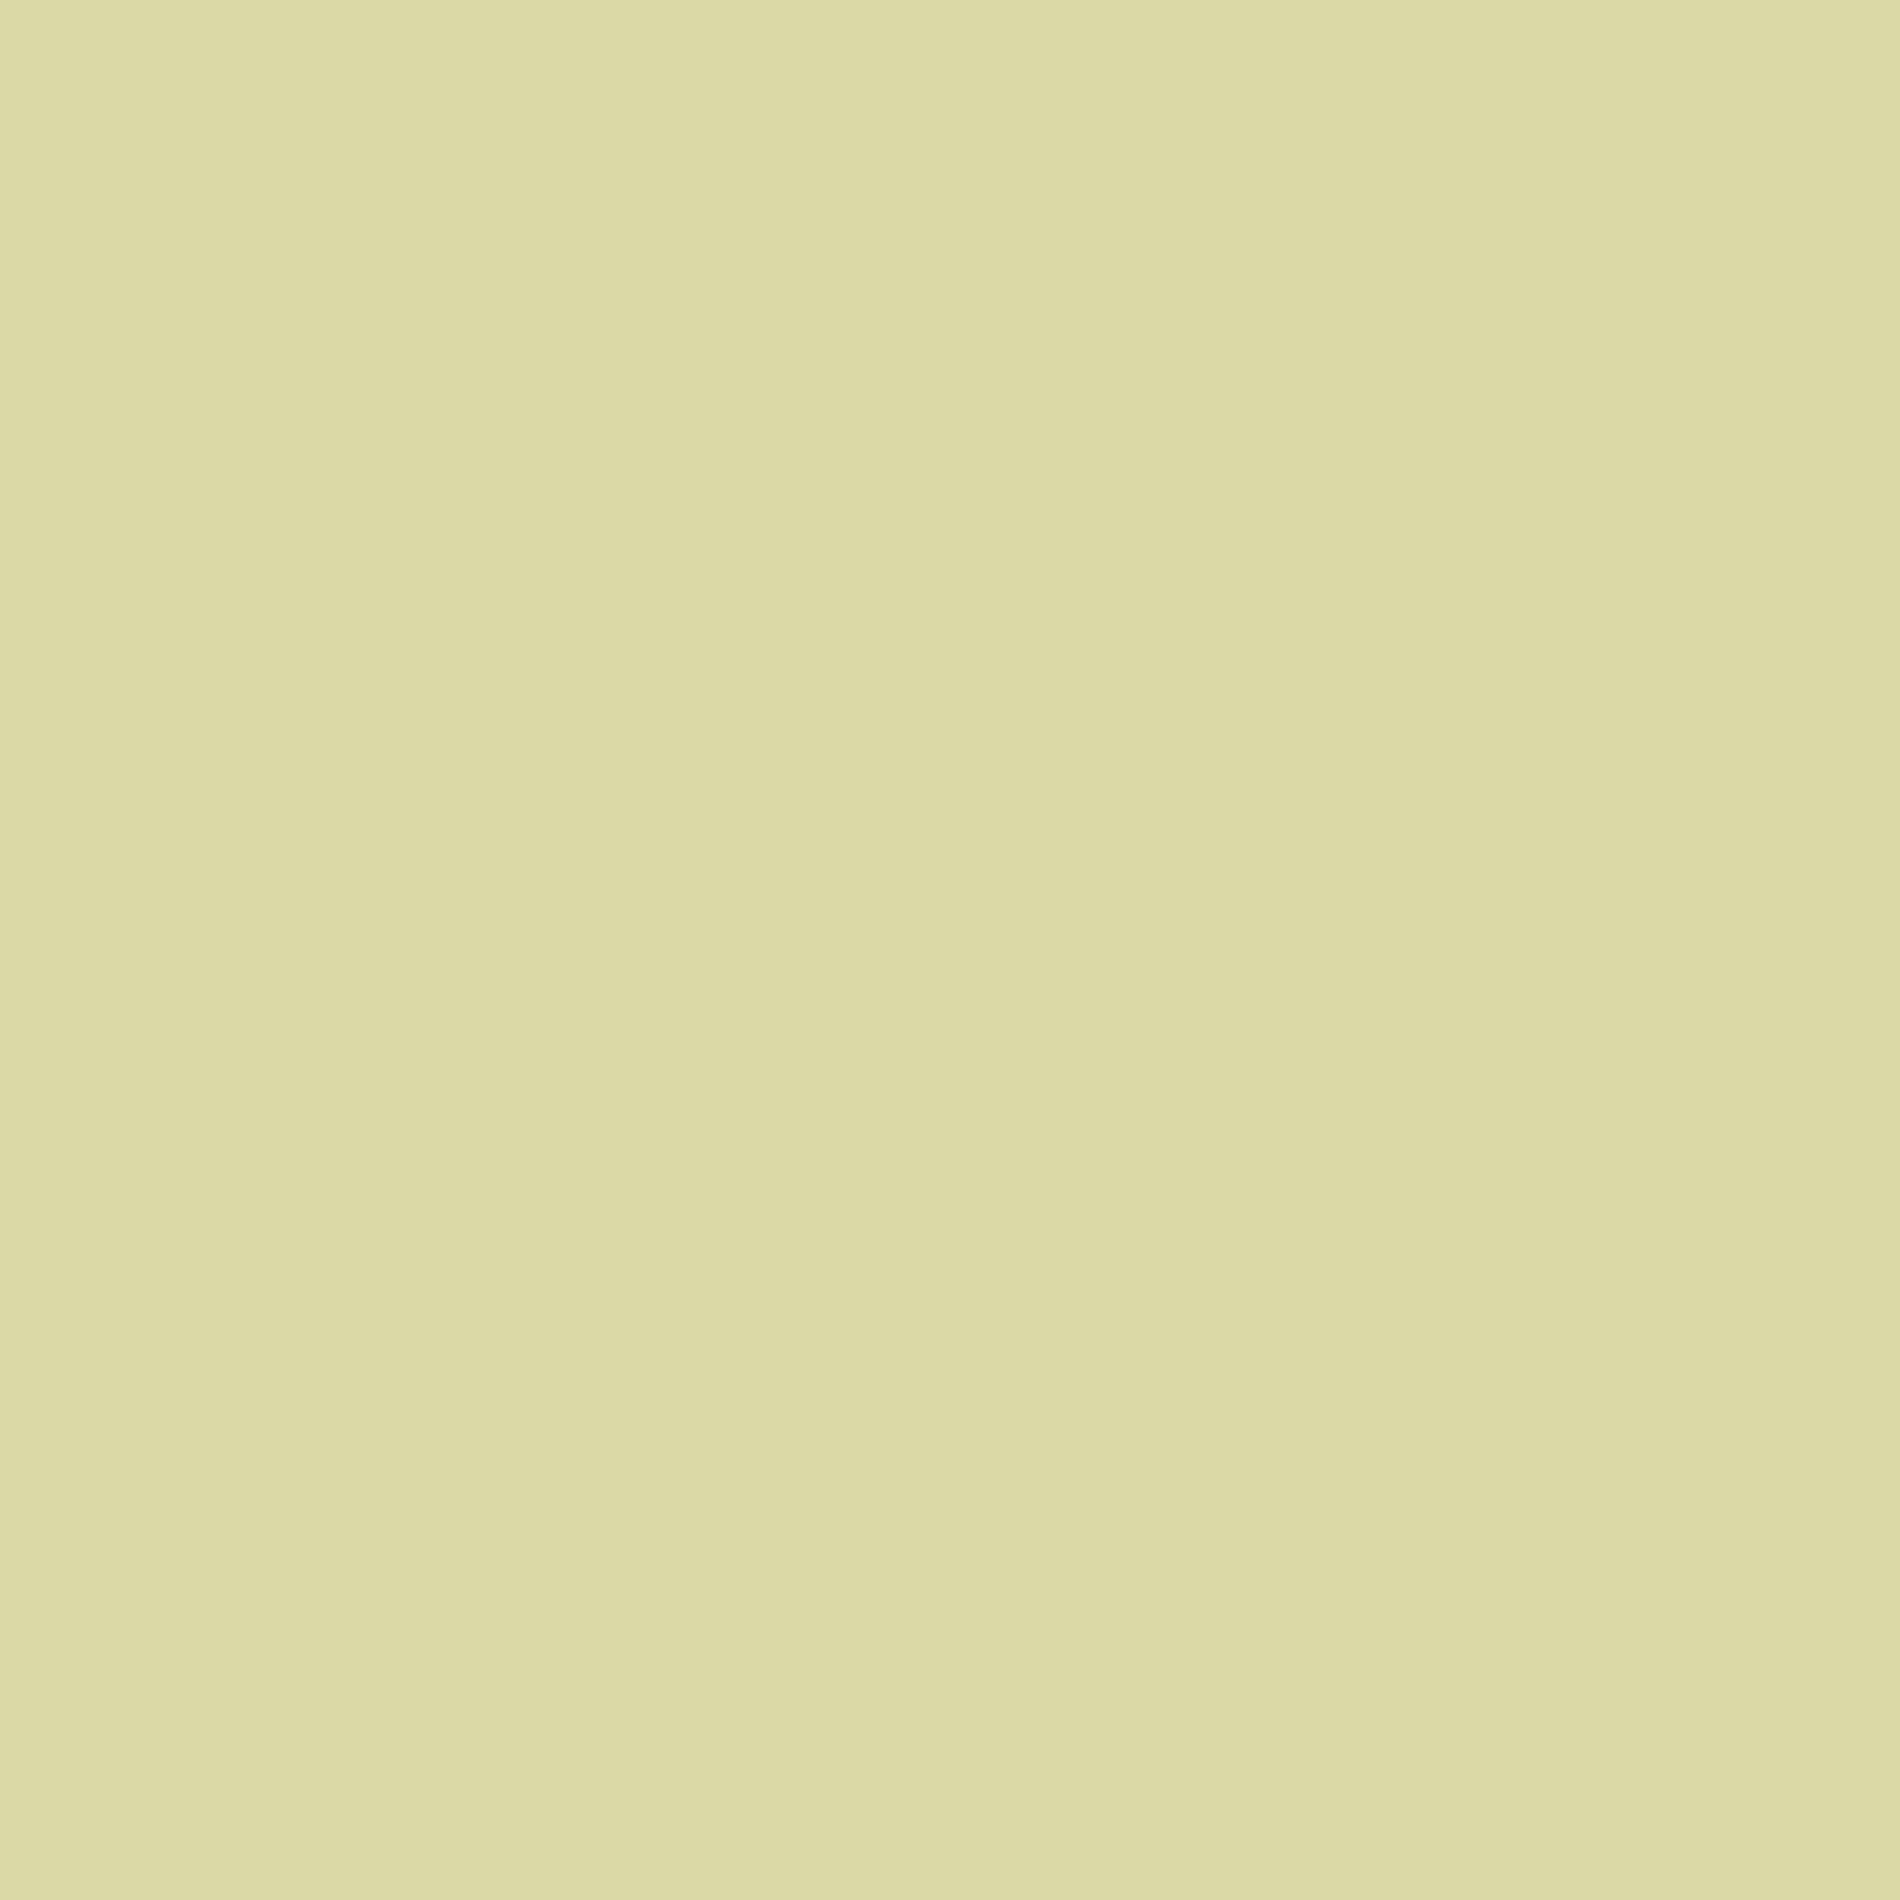 33 - hellgrün